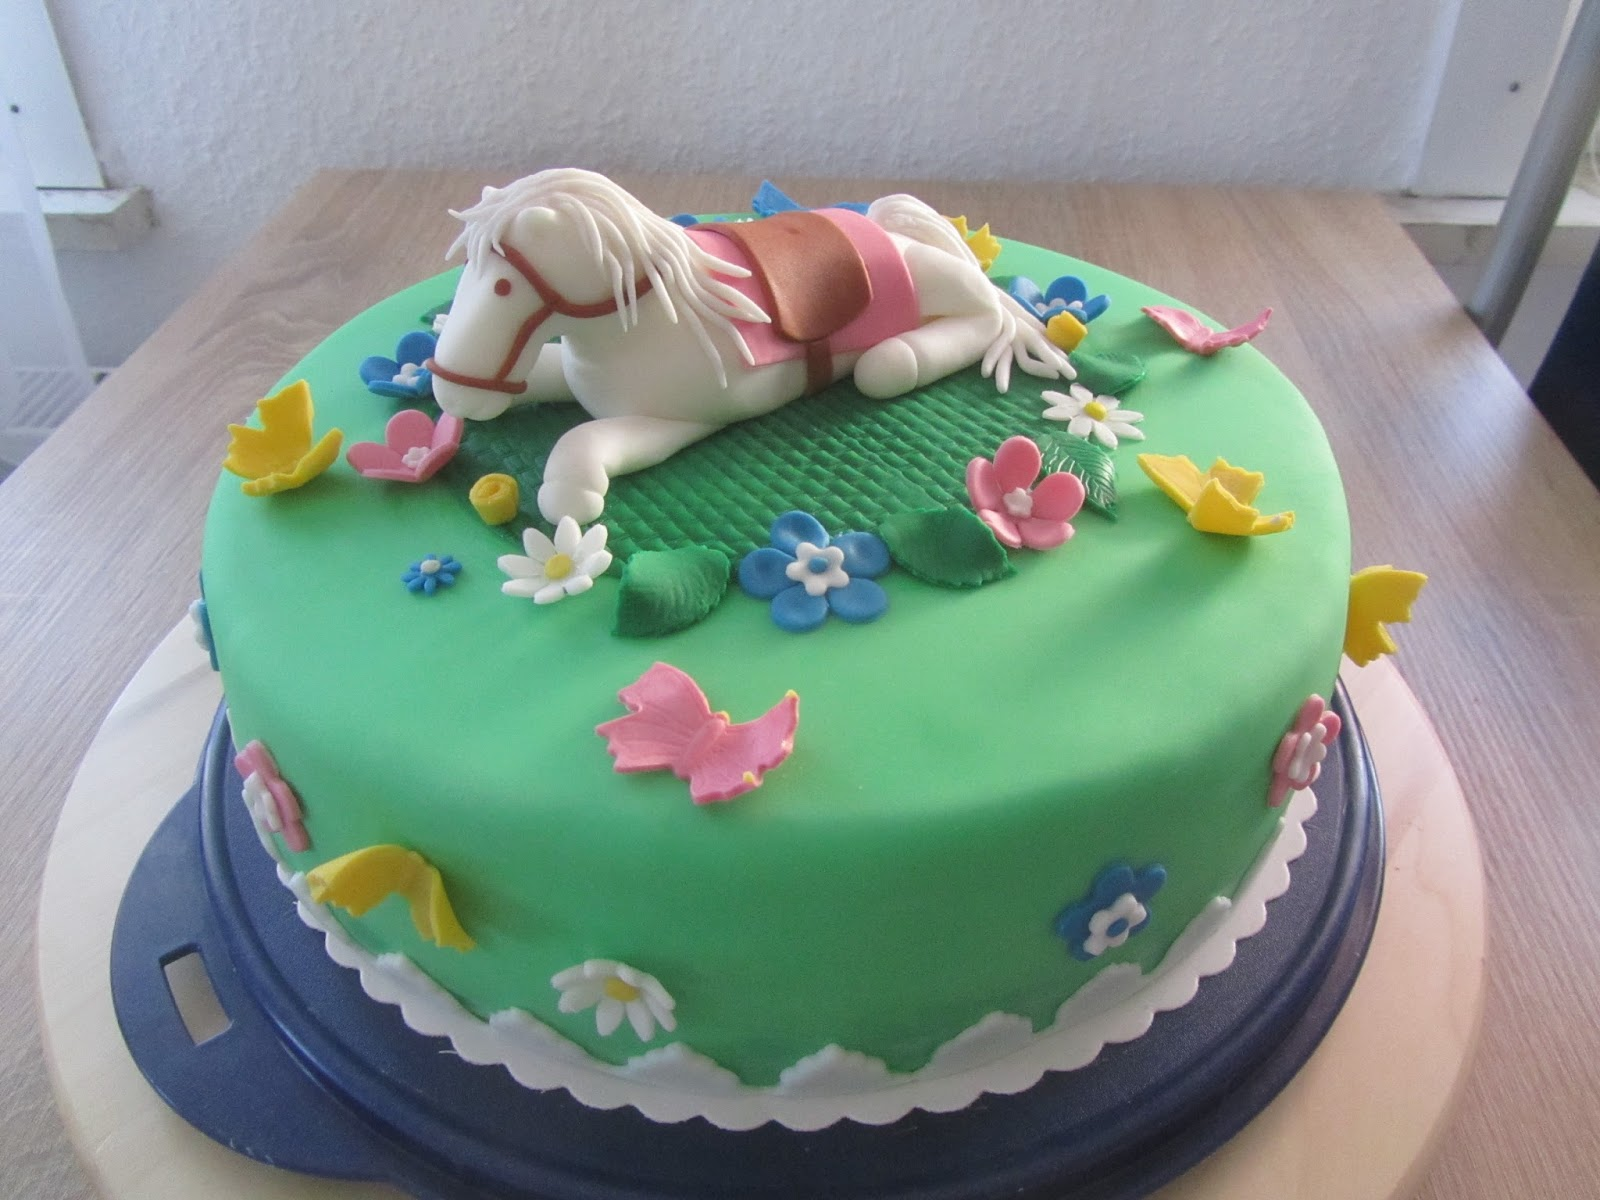 Pferde Geburtstags Torte Fondant Anke S Torten Wunsch